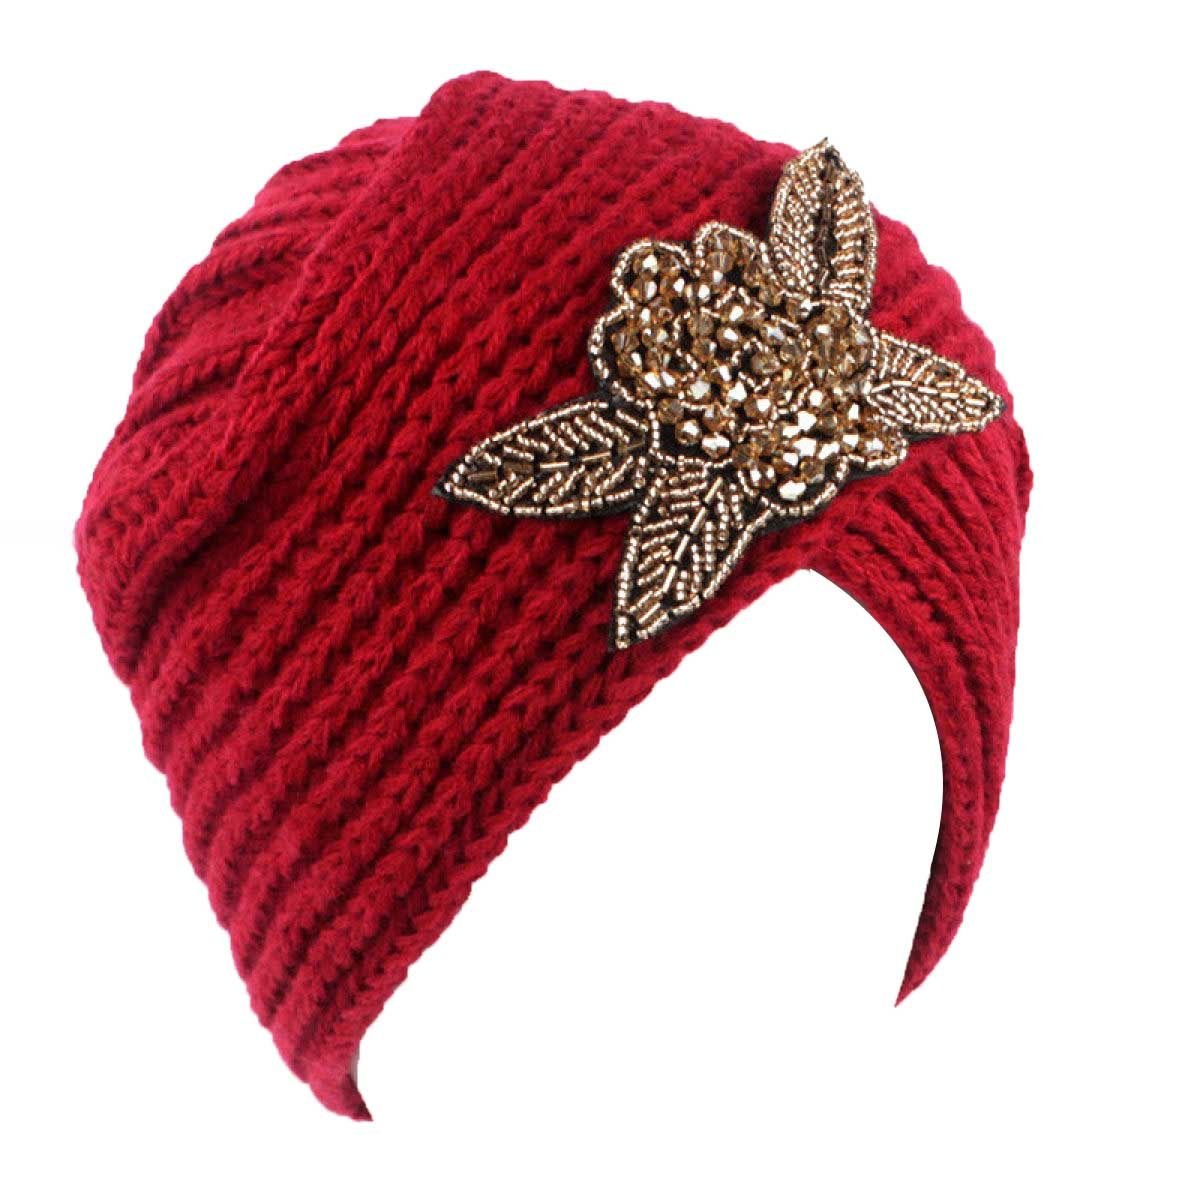 DUYANGANG Frauen Beanie Damen Winter Warm Knit Häkeln Ski Hut ...